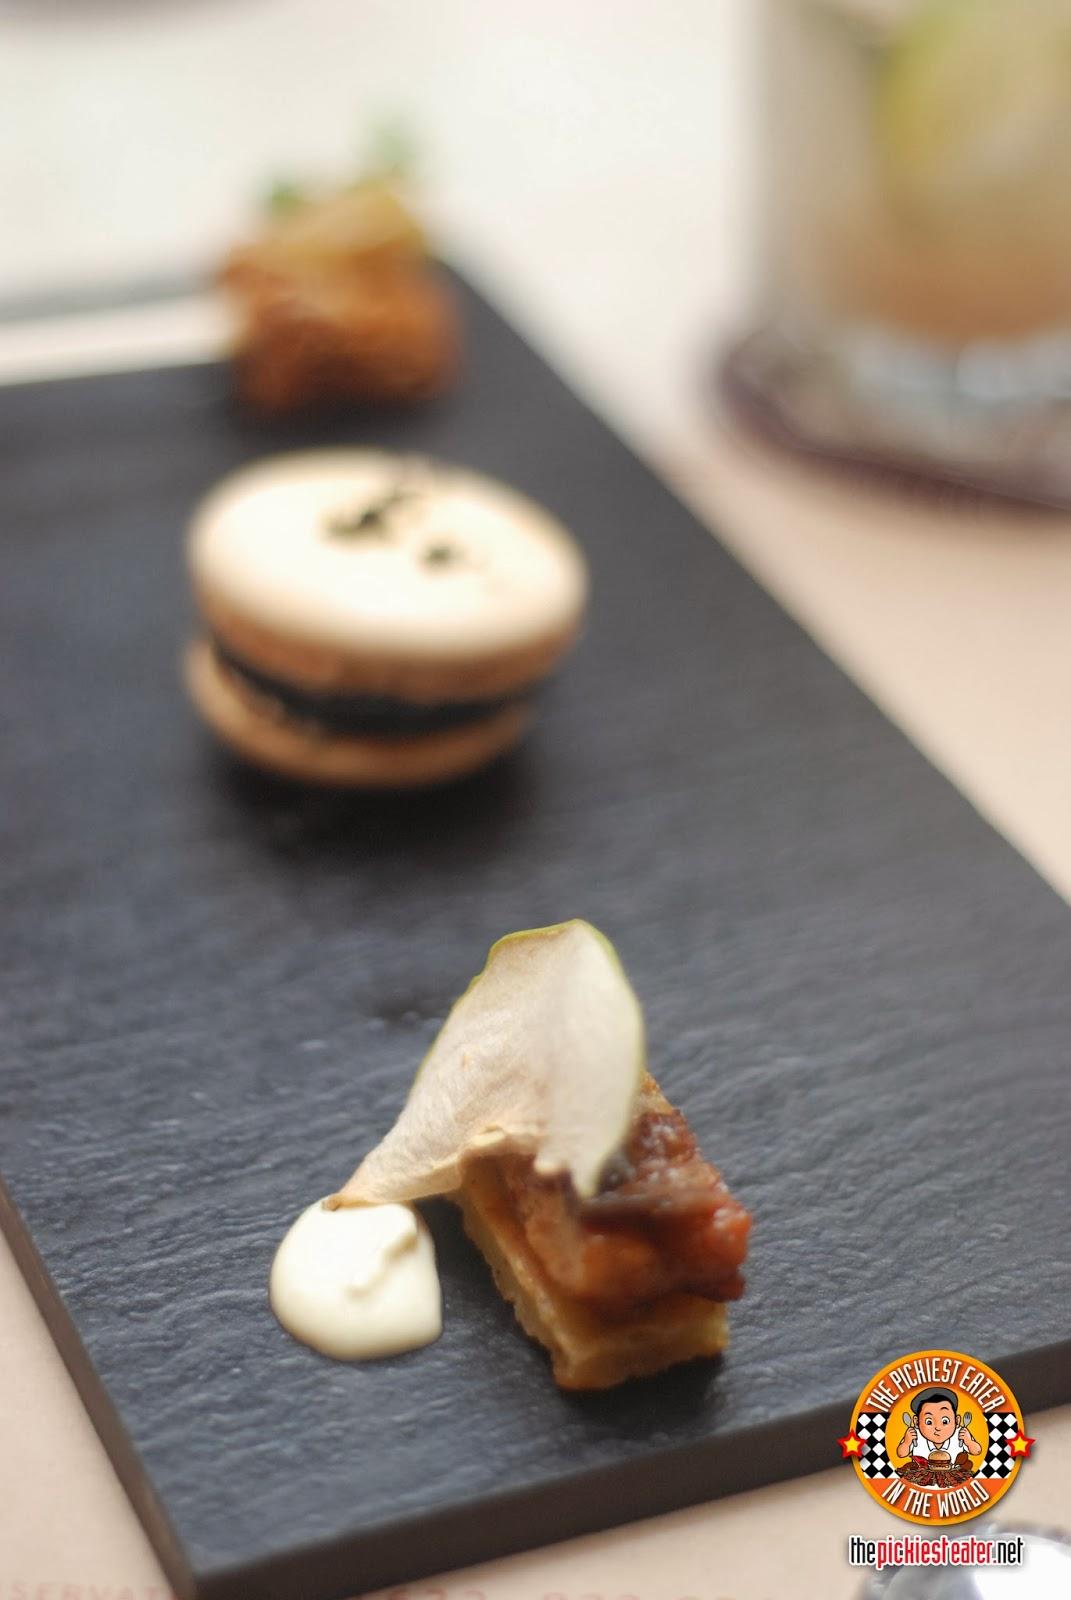 otkb Foie Gras Popsicle, Caponata Macaron, Eel Apple Galatte